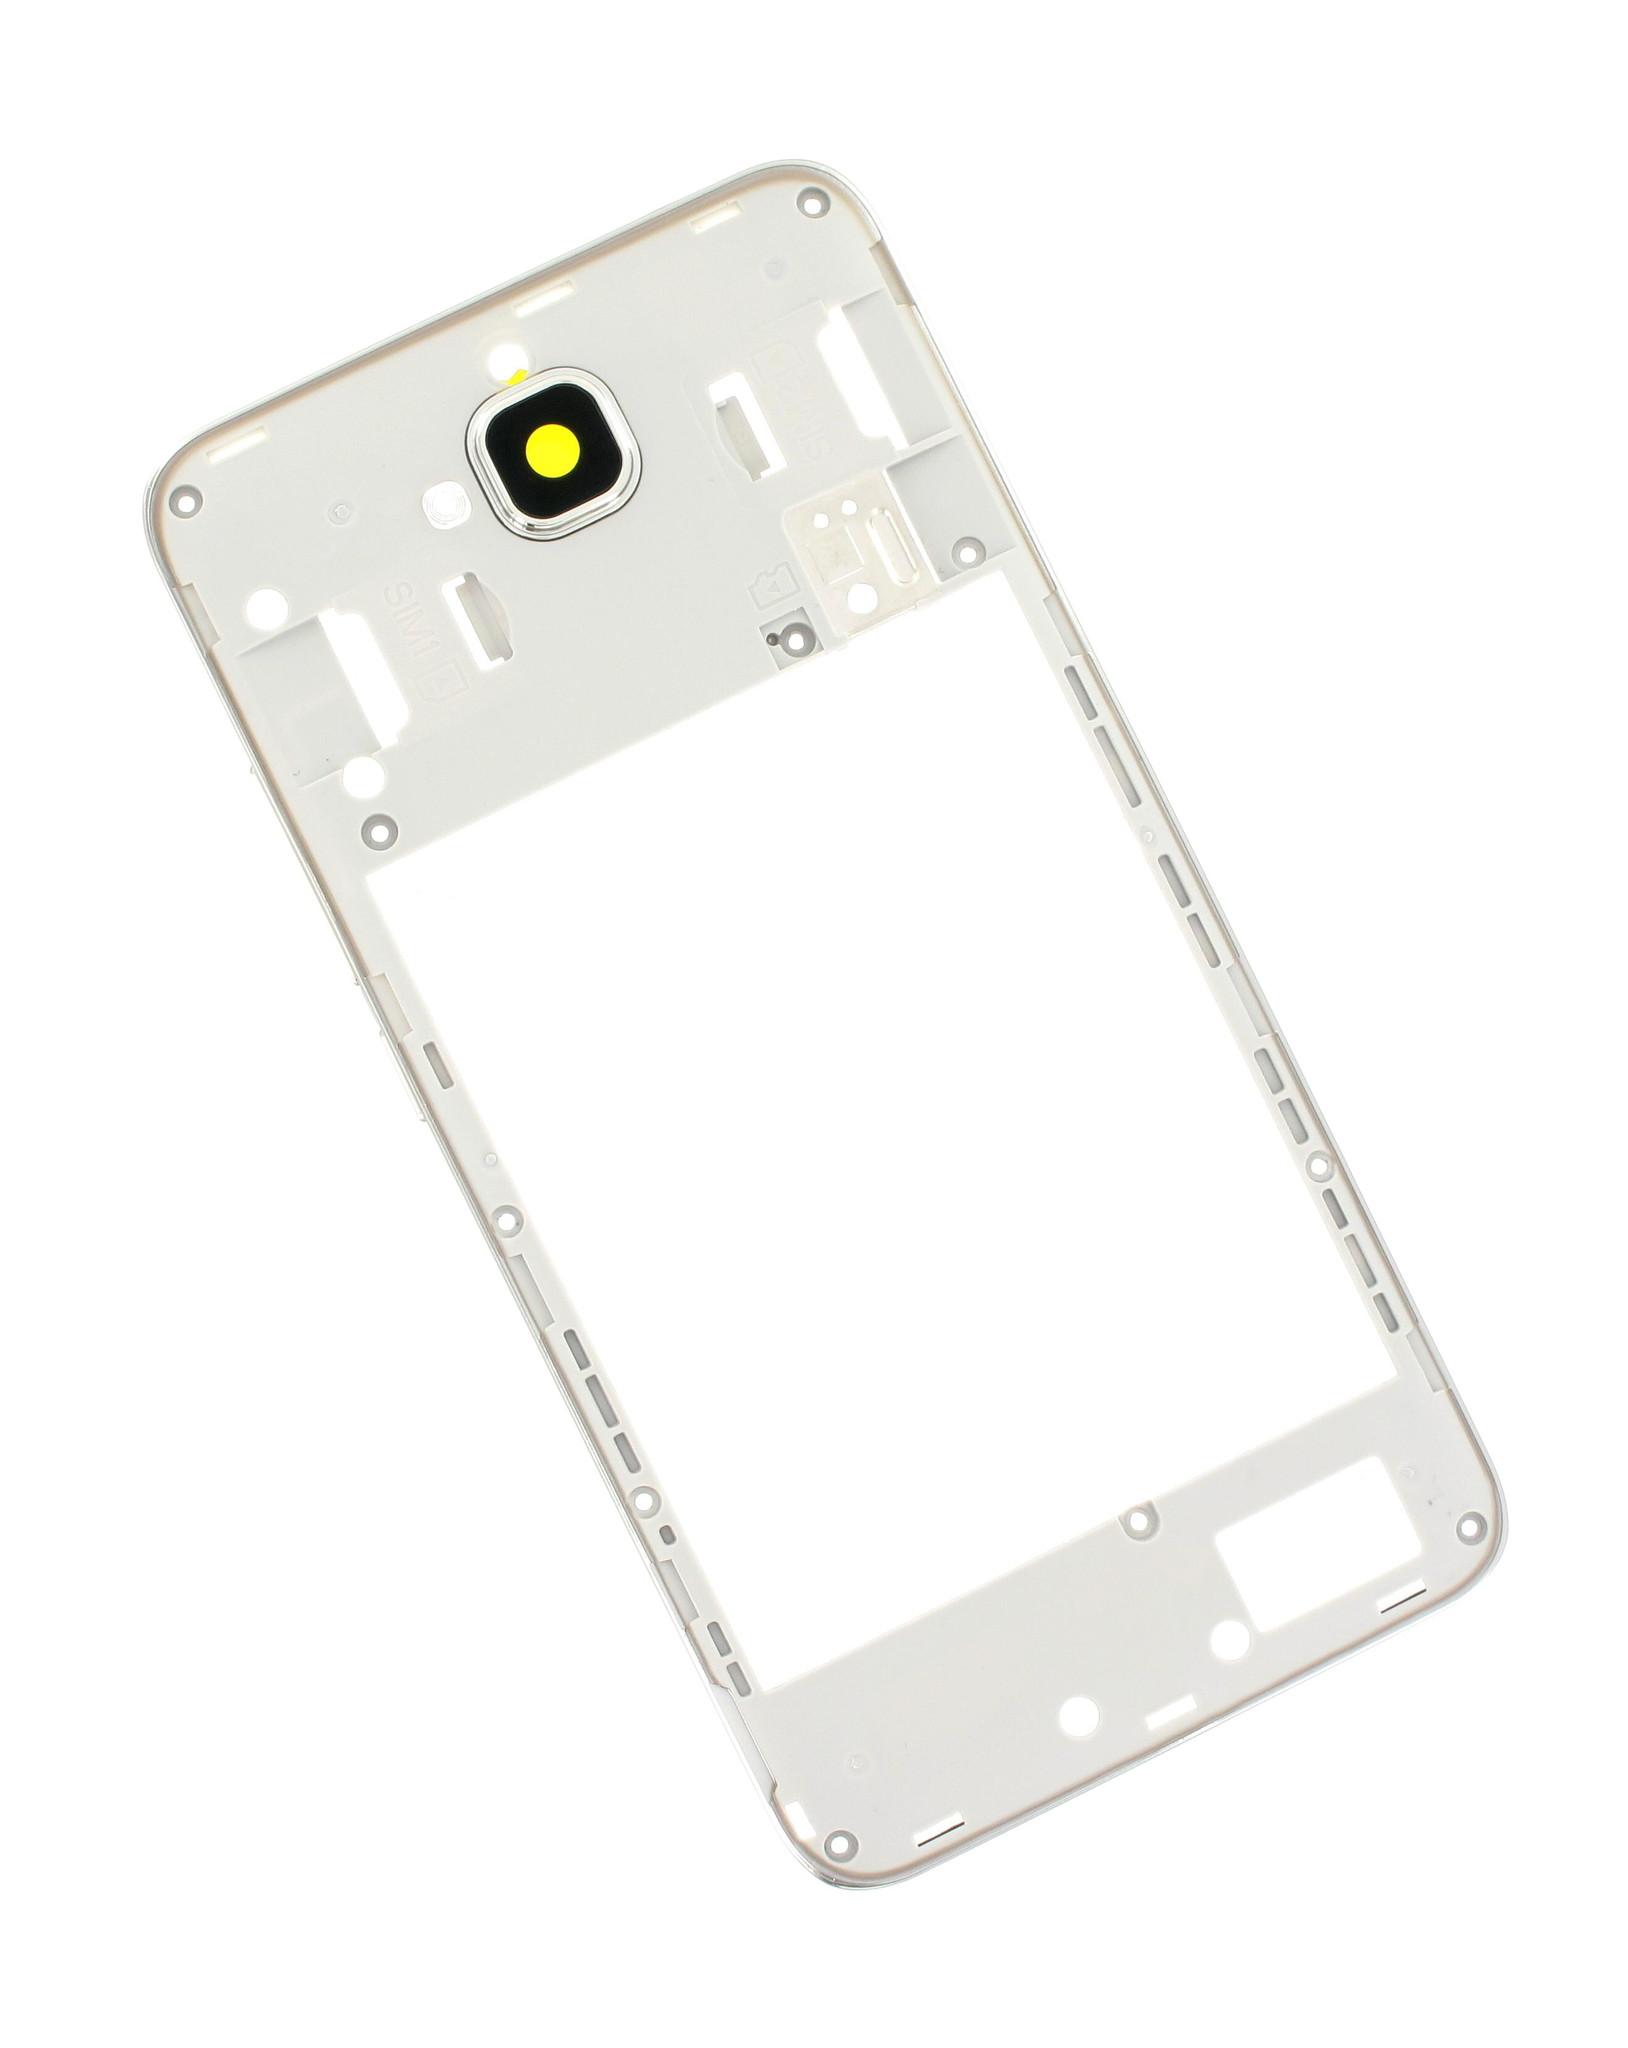 Huawei Y6 Pro 4G (TIT-AL00) Battery Cover, Gold, 97070LJK - Parts4GSM